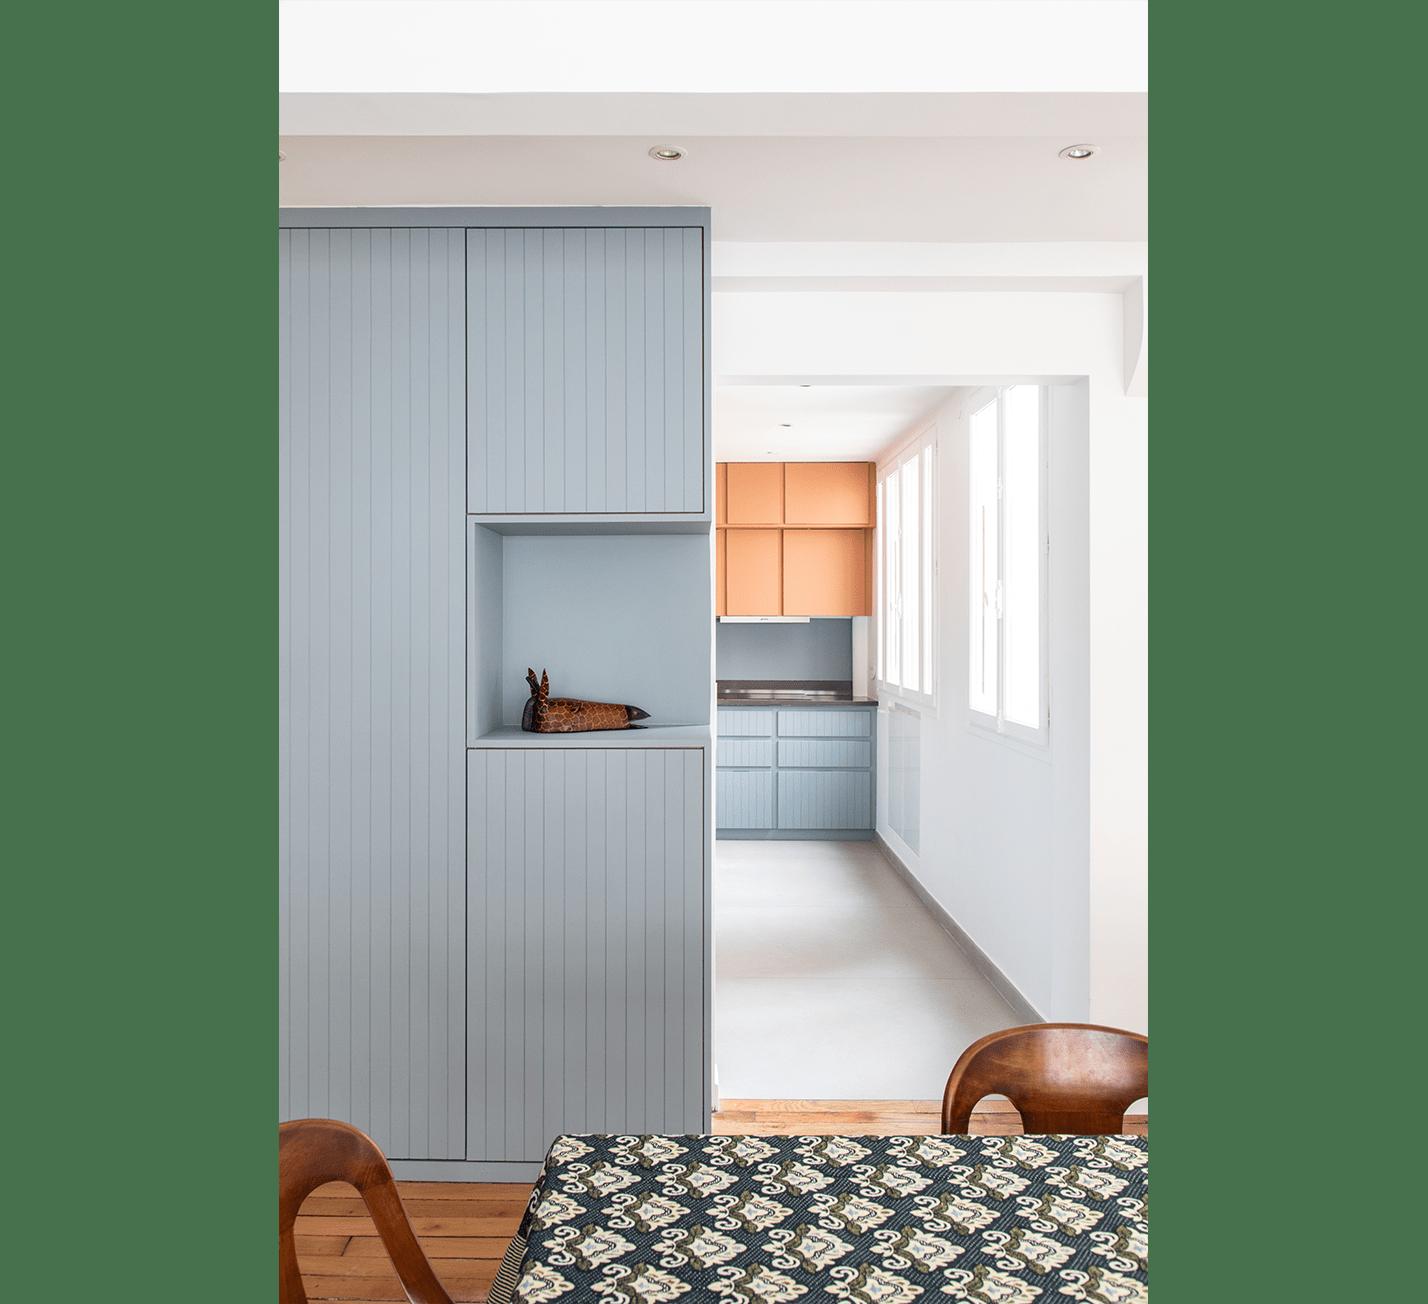 Projet-Senoch-Atelier-Steve-Pauline-Borgia-Architecte-interieur-11-min